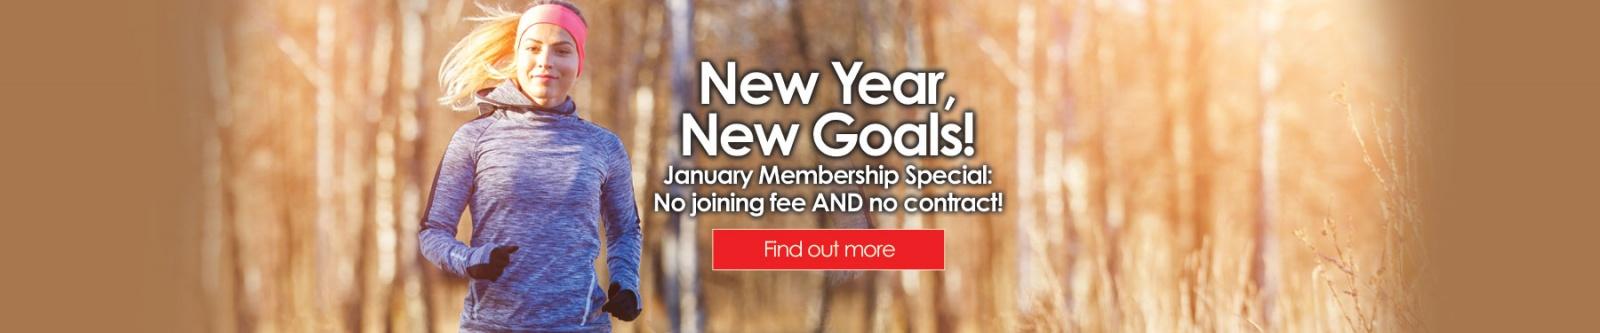 January Membership Special Bellingham Athletic Club